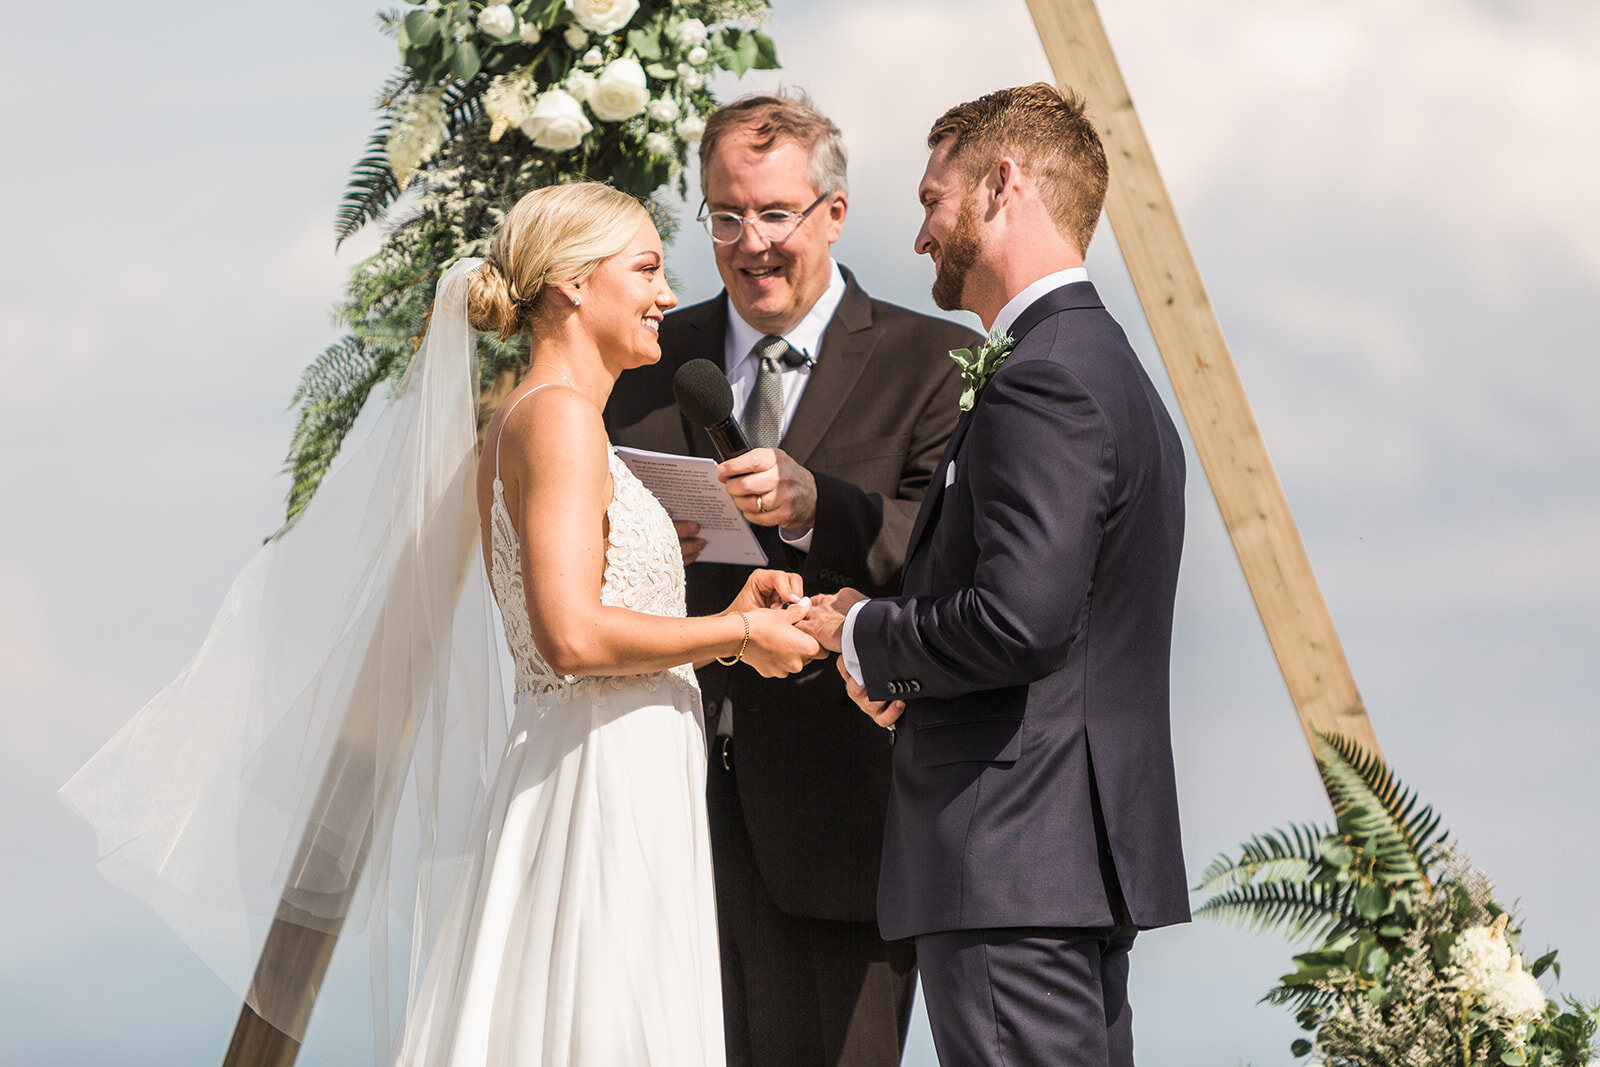 spokane bride and groom wedding ceremony spokane